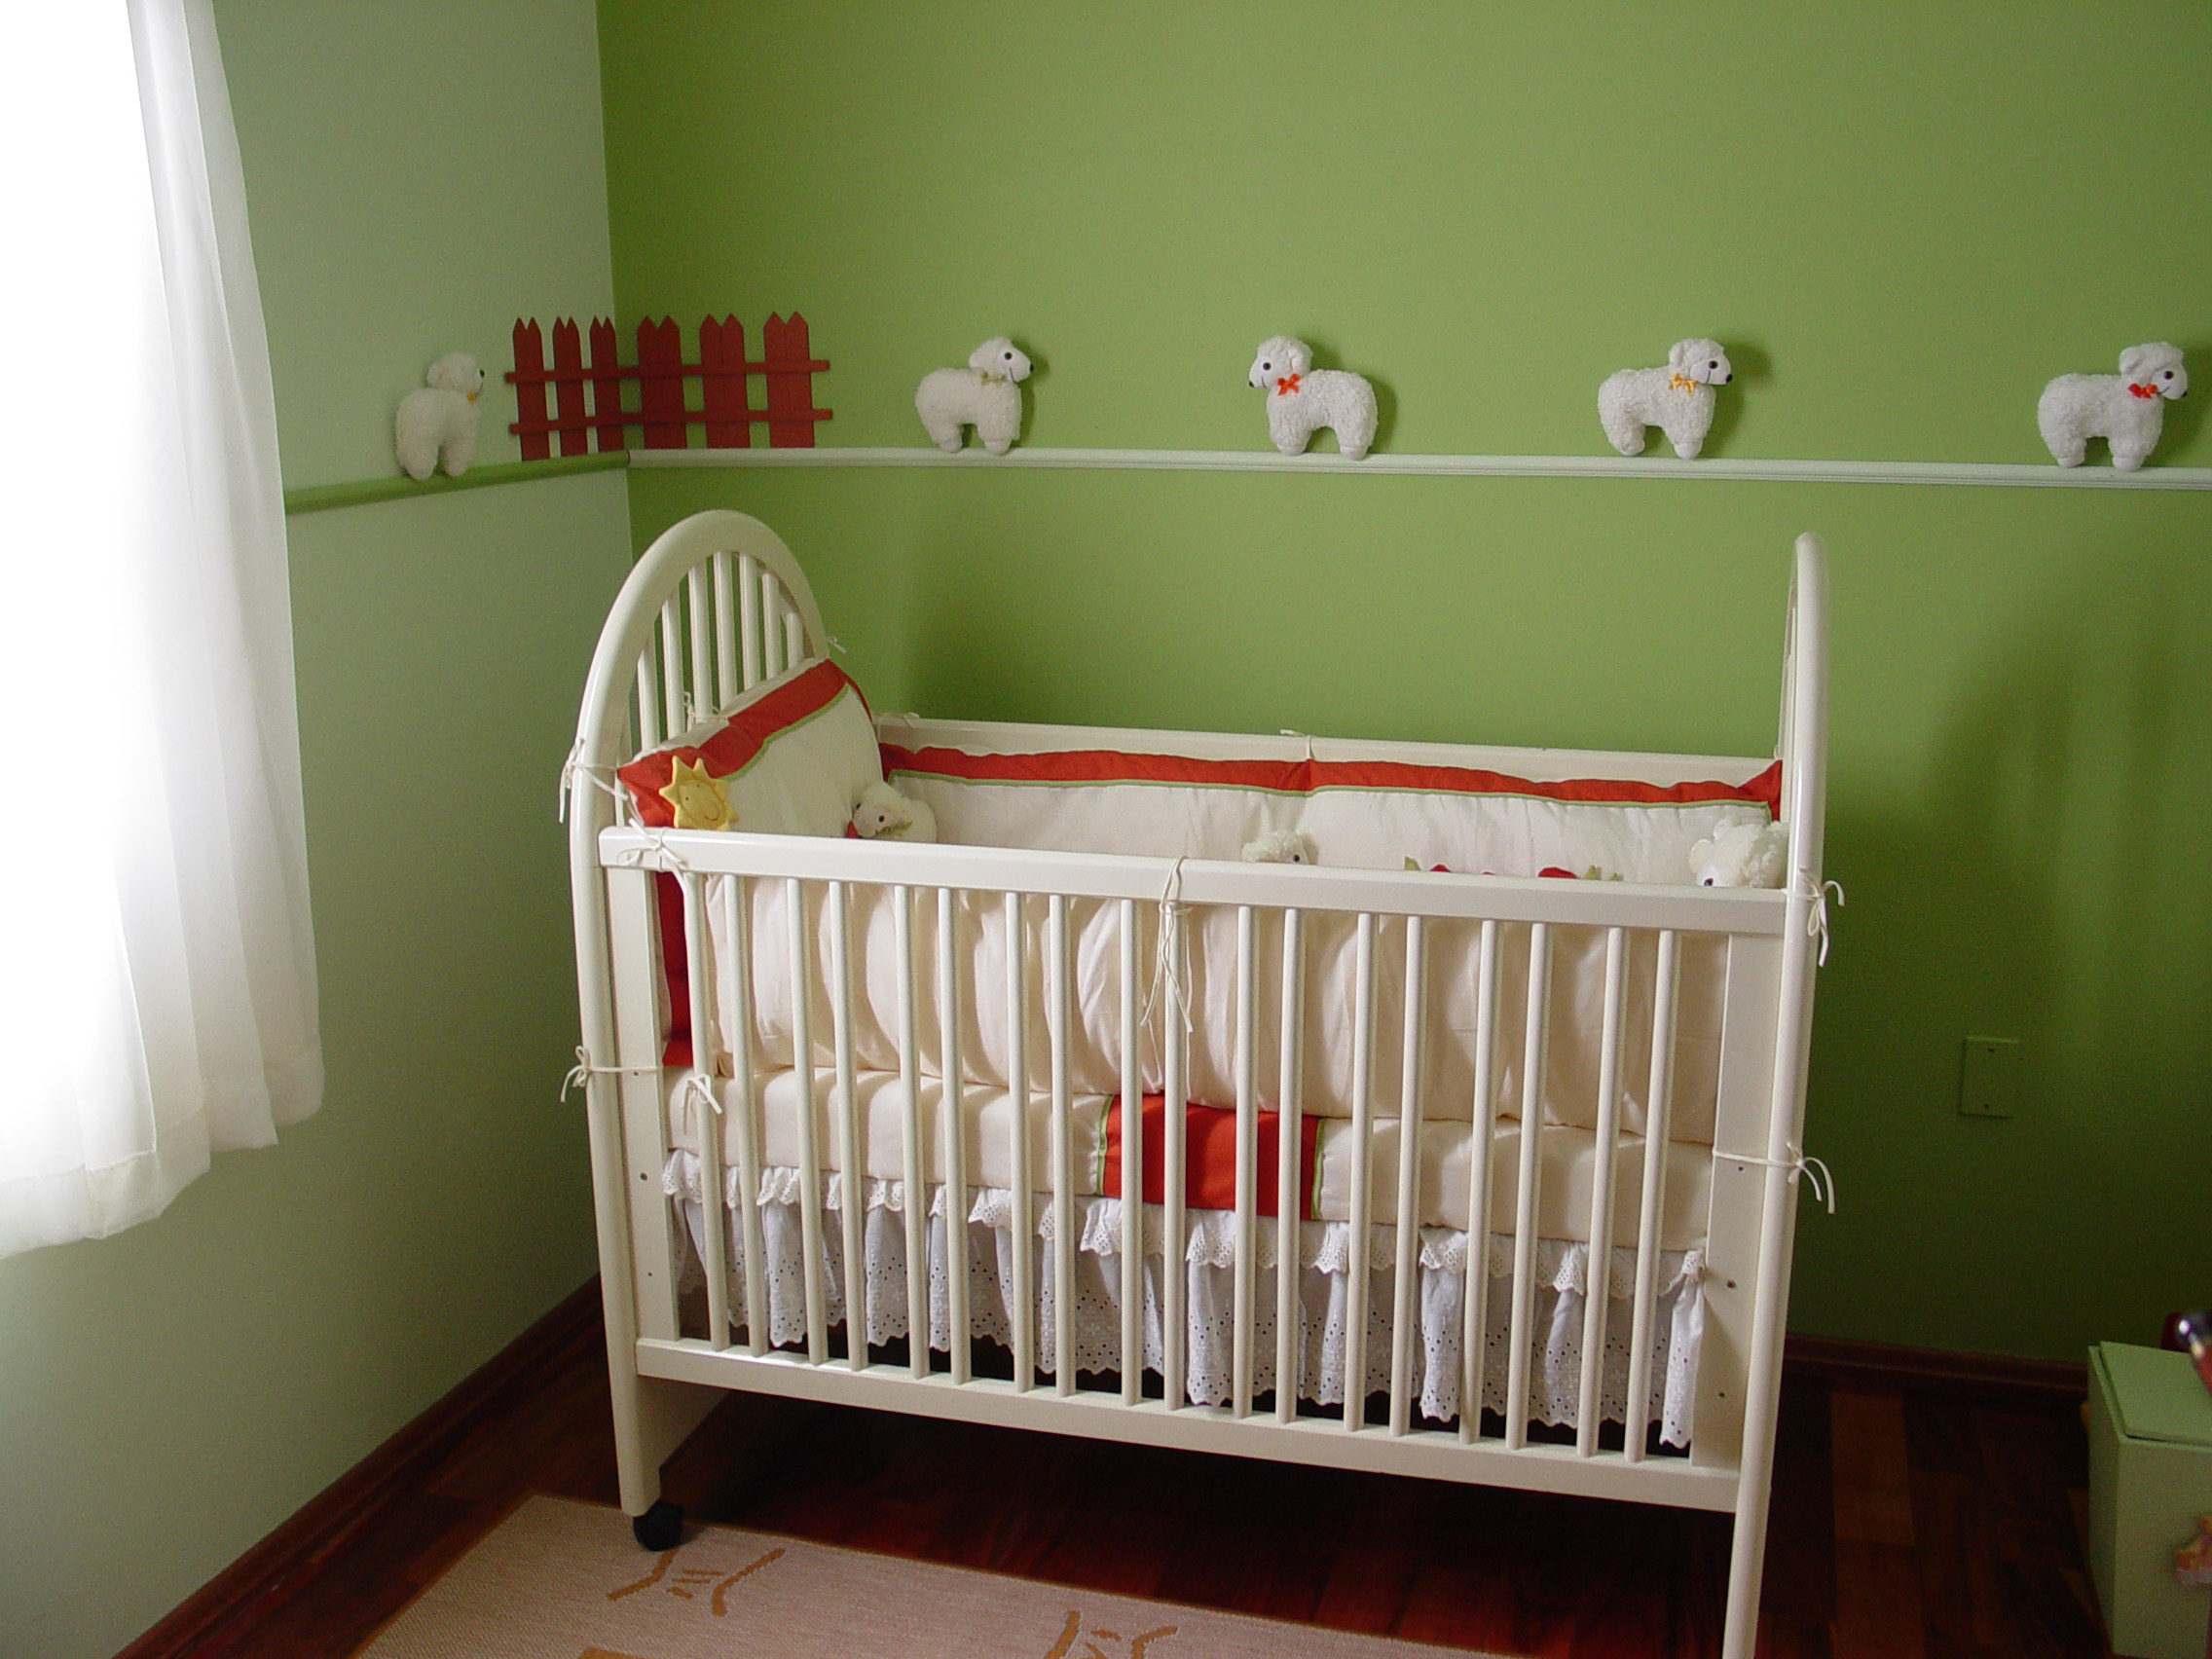 Baby Monitors Cot_The Happy Habitat